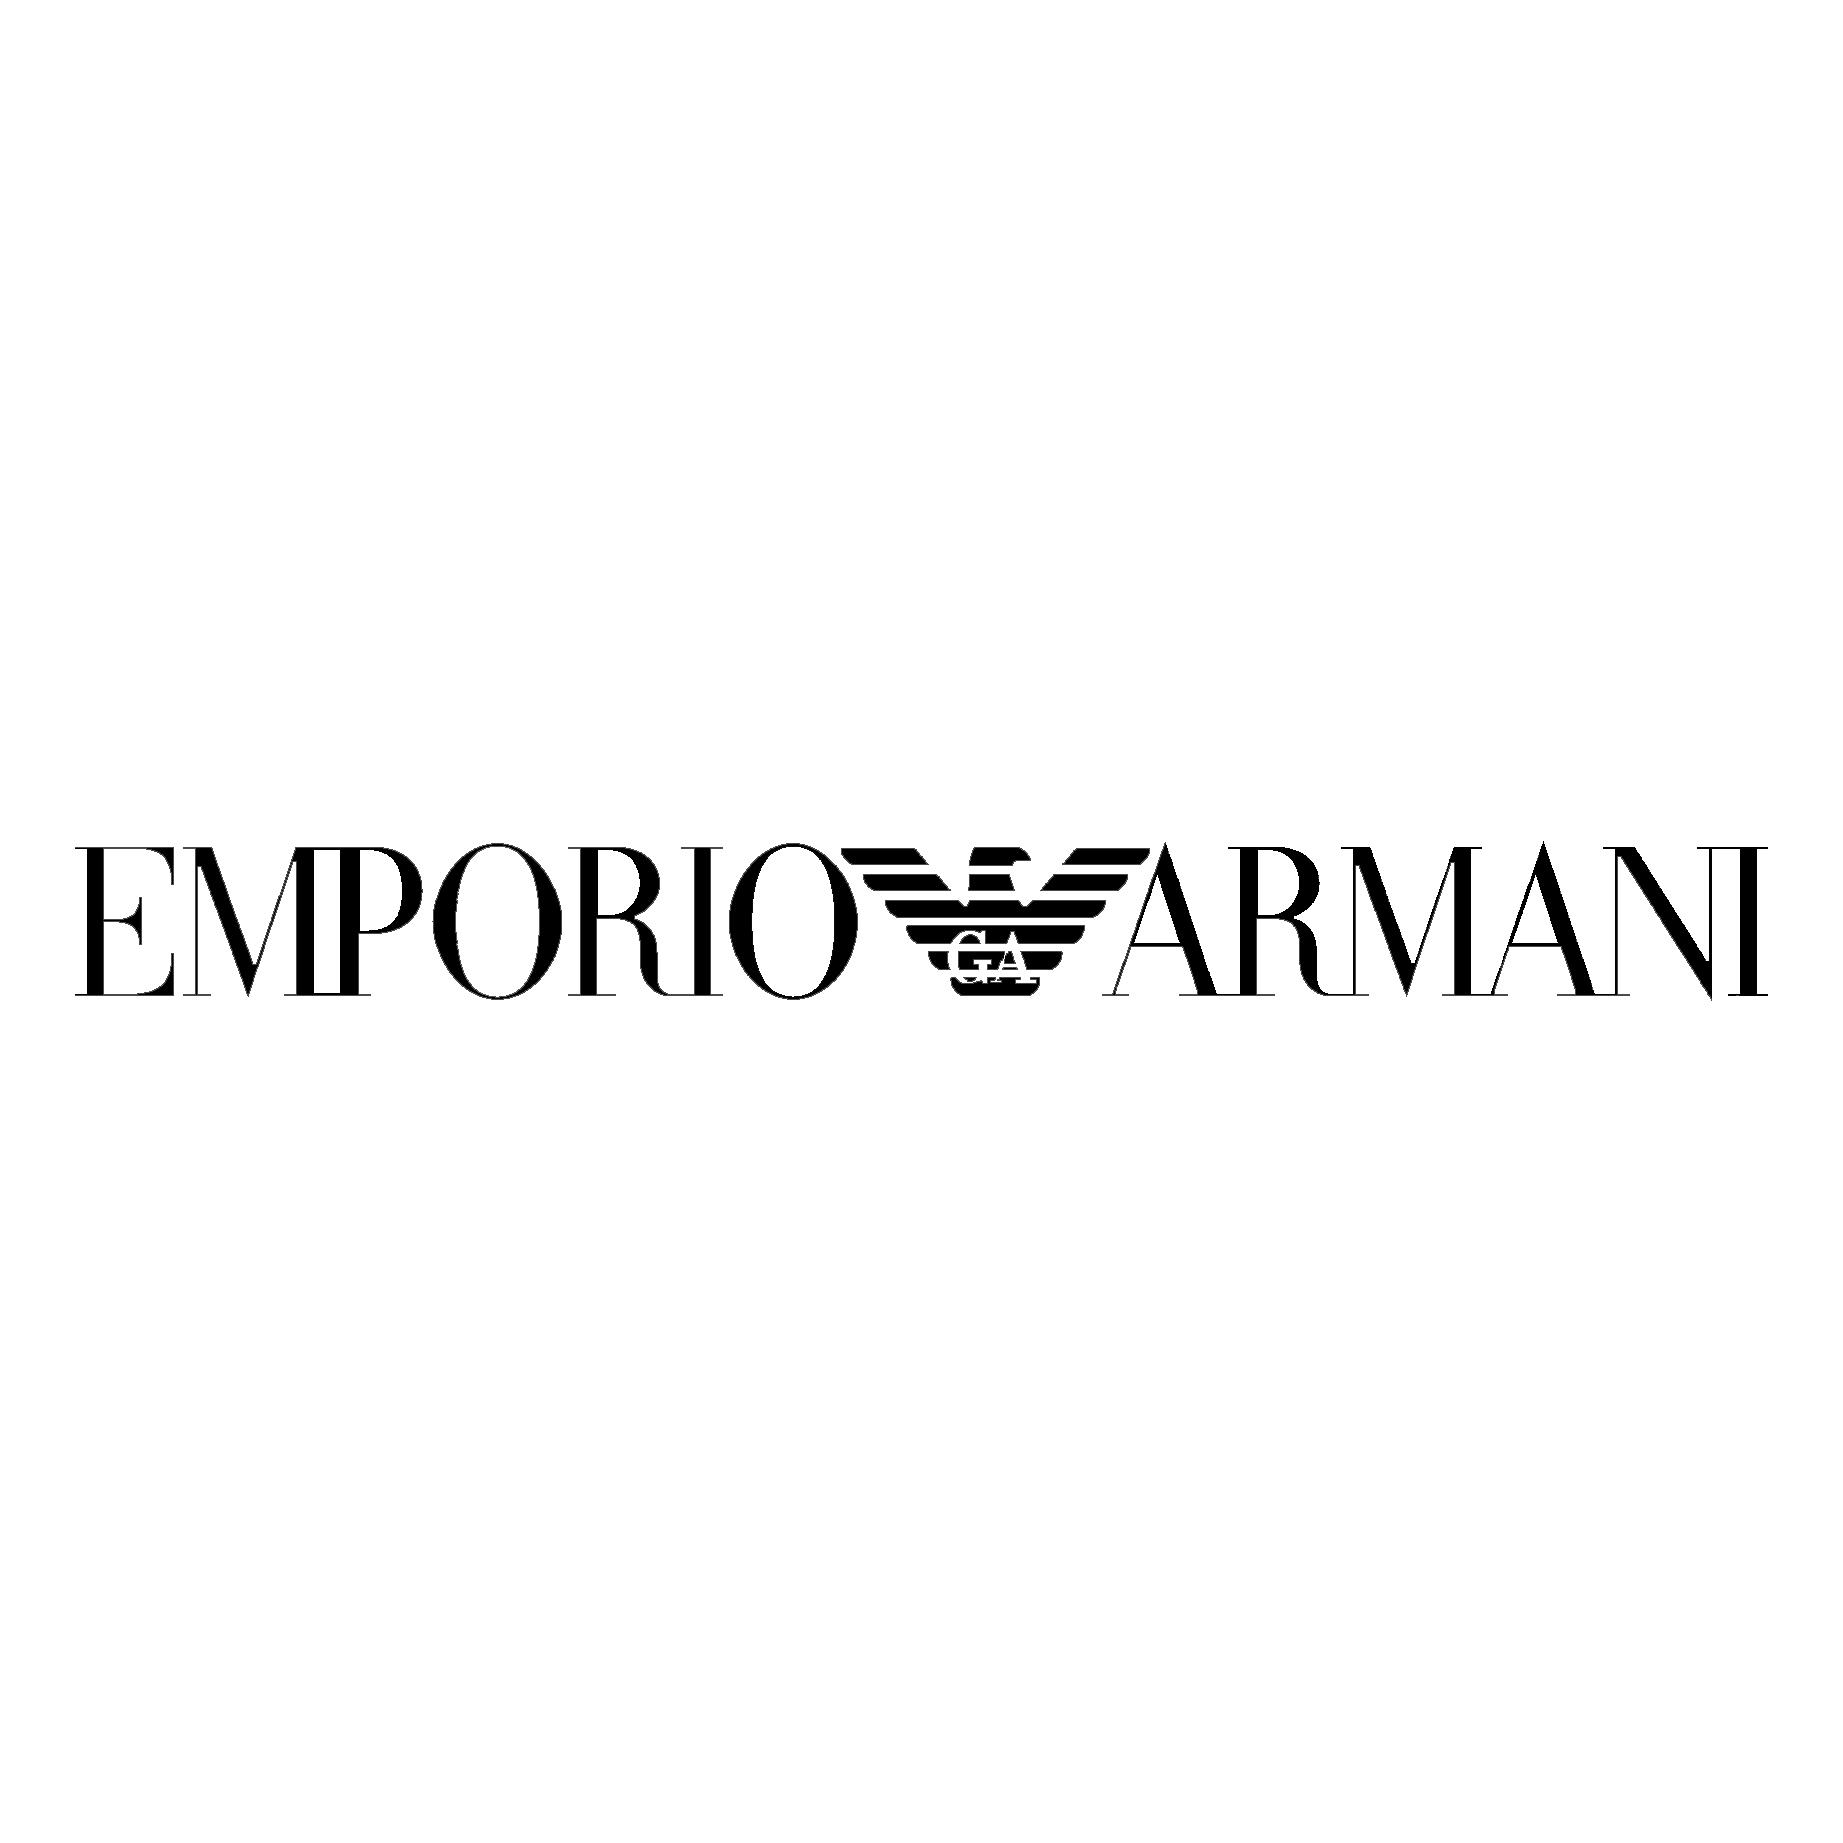 Armani's logo